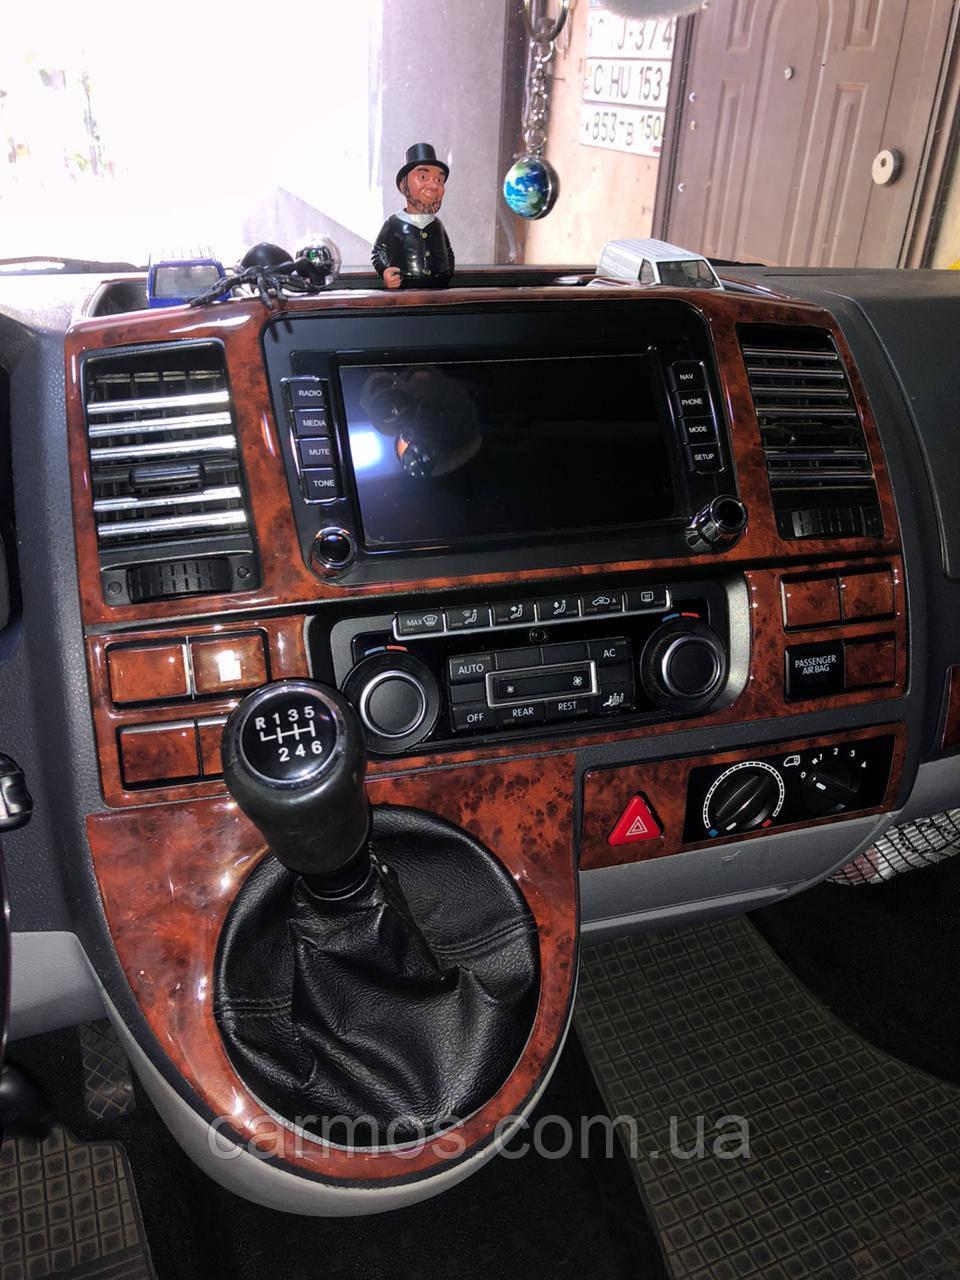 Декор панели (накладки на панель) Volkswagen Т5/T6 (фольксваген т5/т6 (2010>)